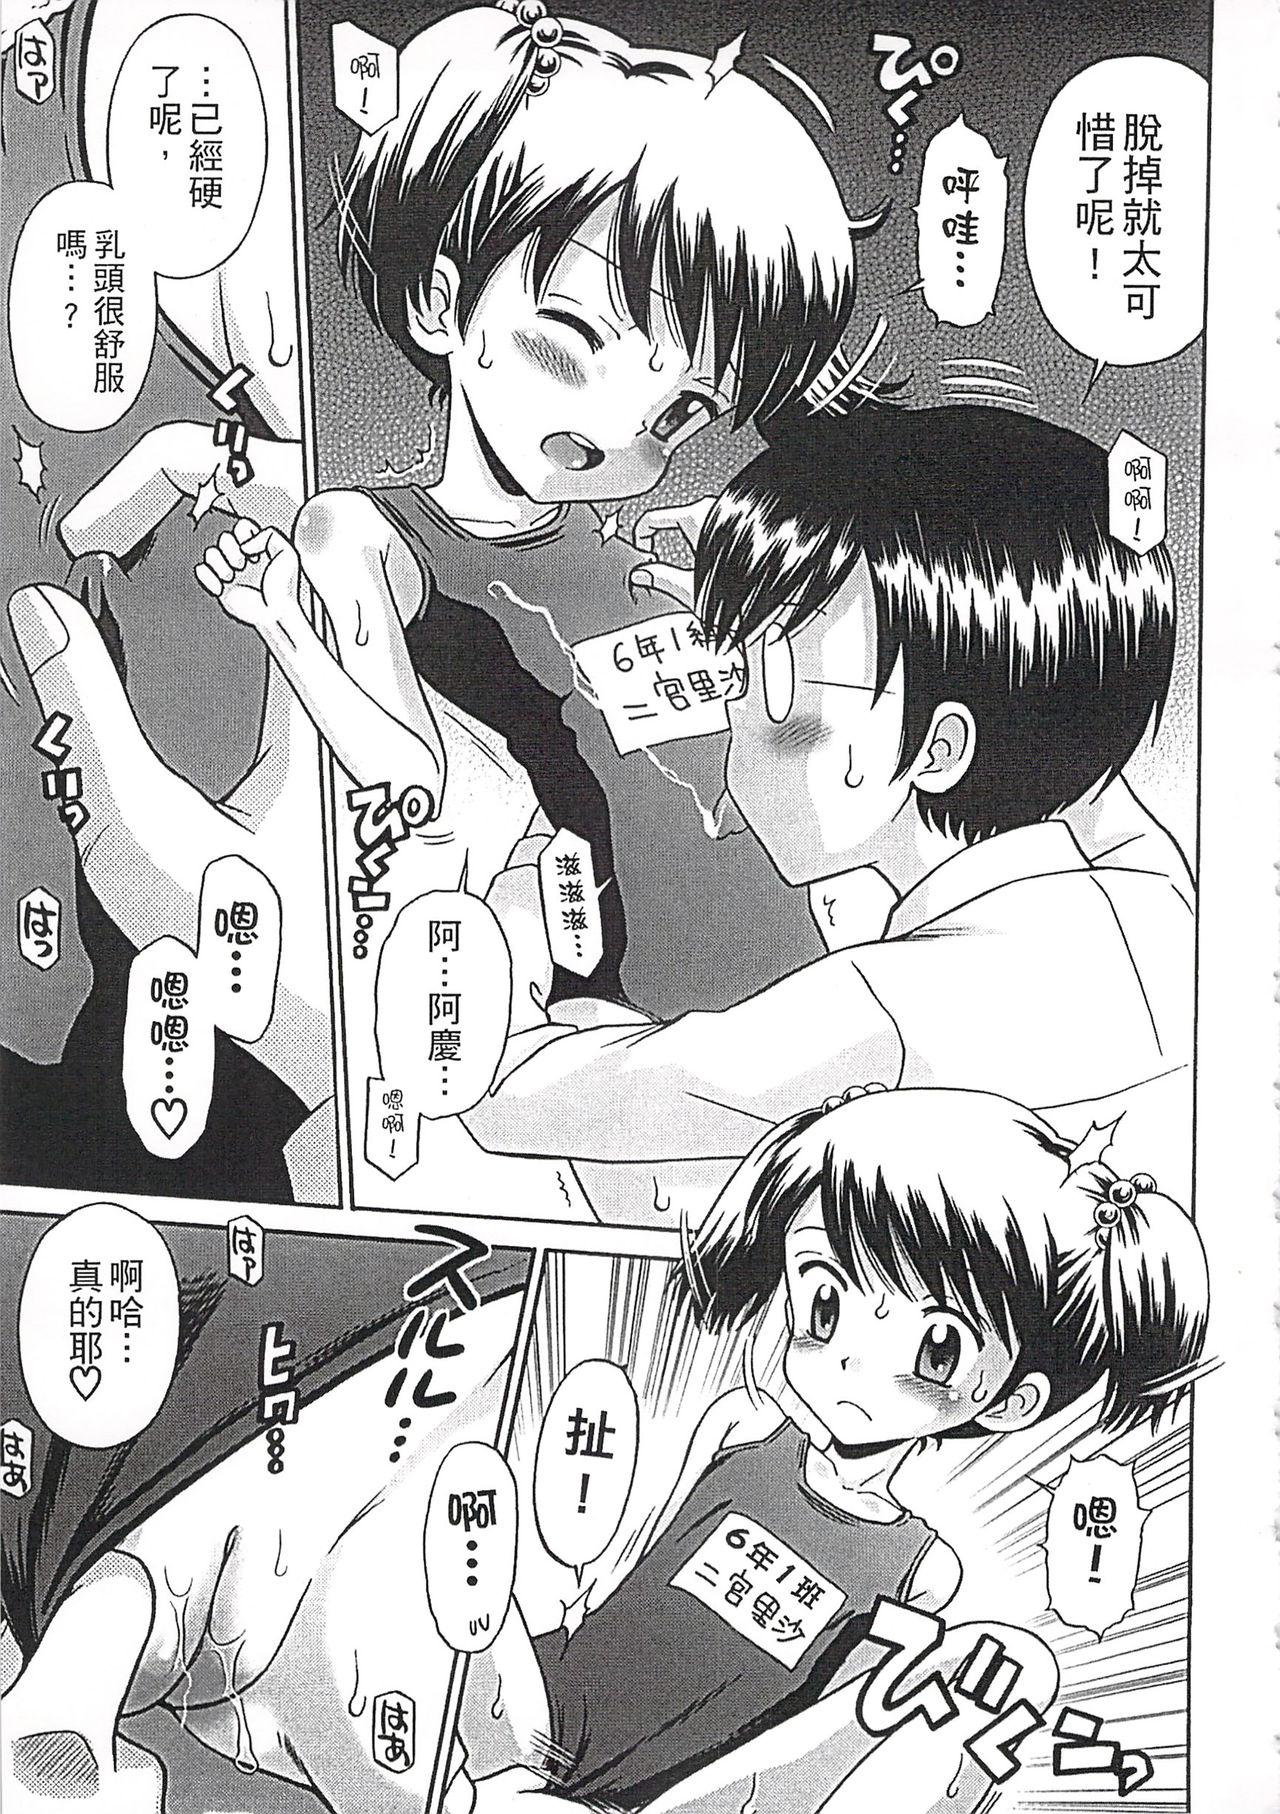 Kore demo Otona Desu Kedo!? Mrs.LOLITA Kanzenban   人家是大人啦! ~Mrs.LOLITA完全版 106